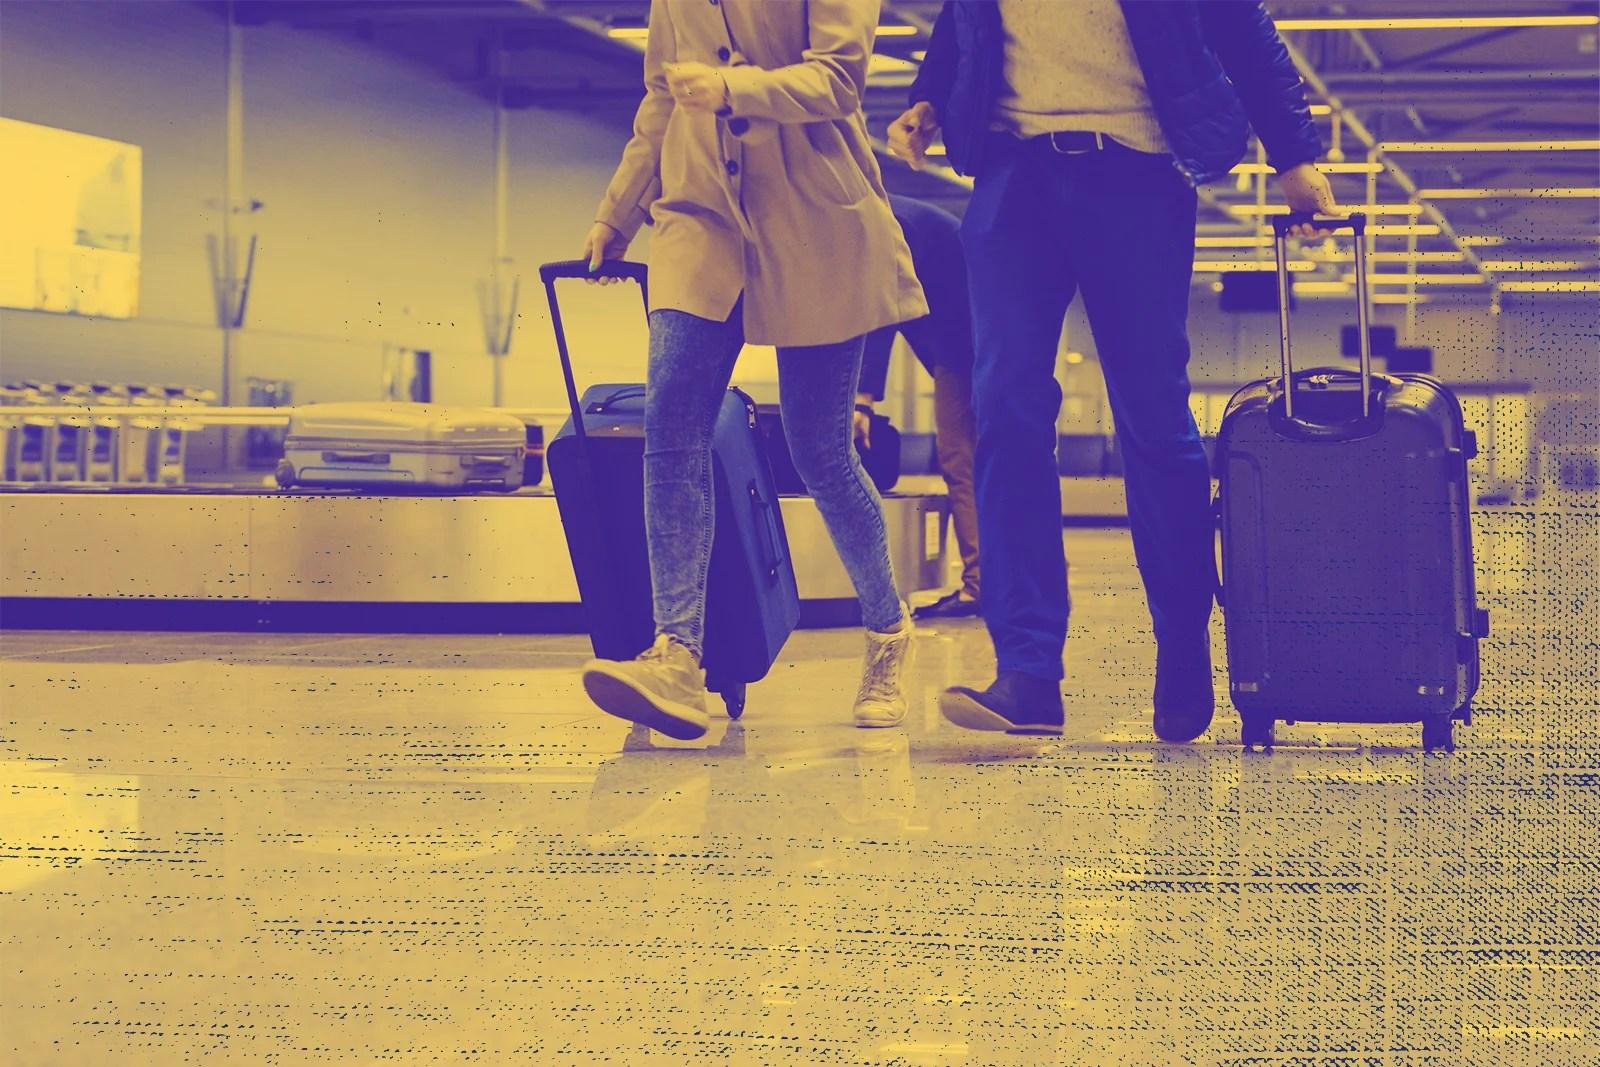 'Your flight already left' — reader mistake story